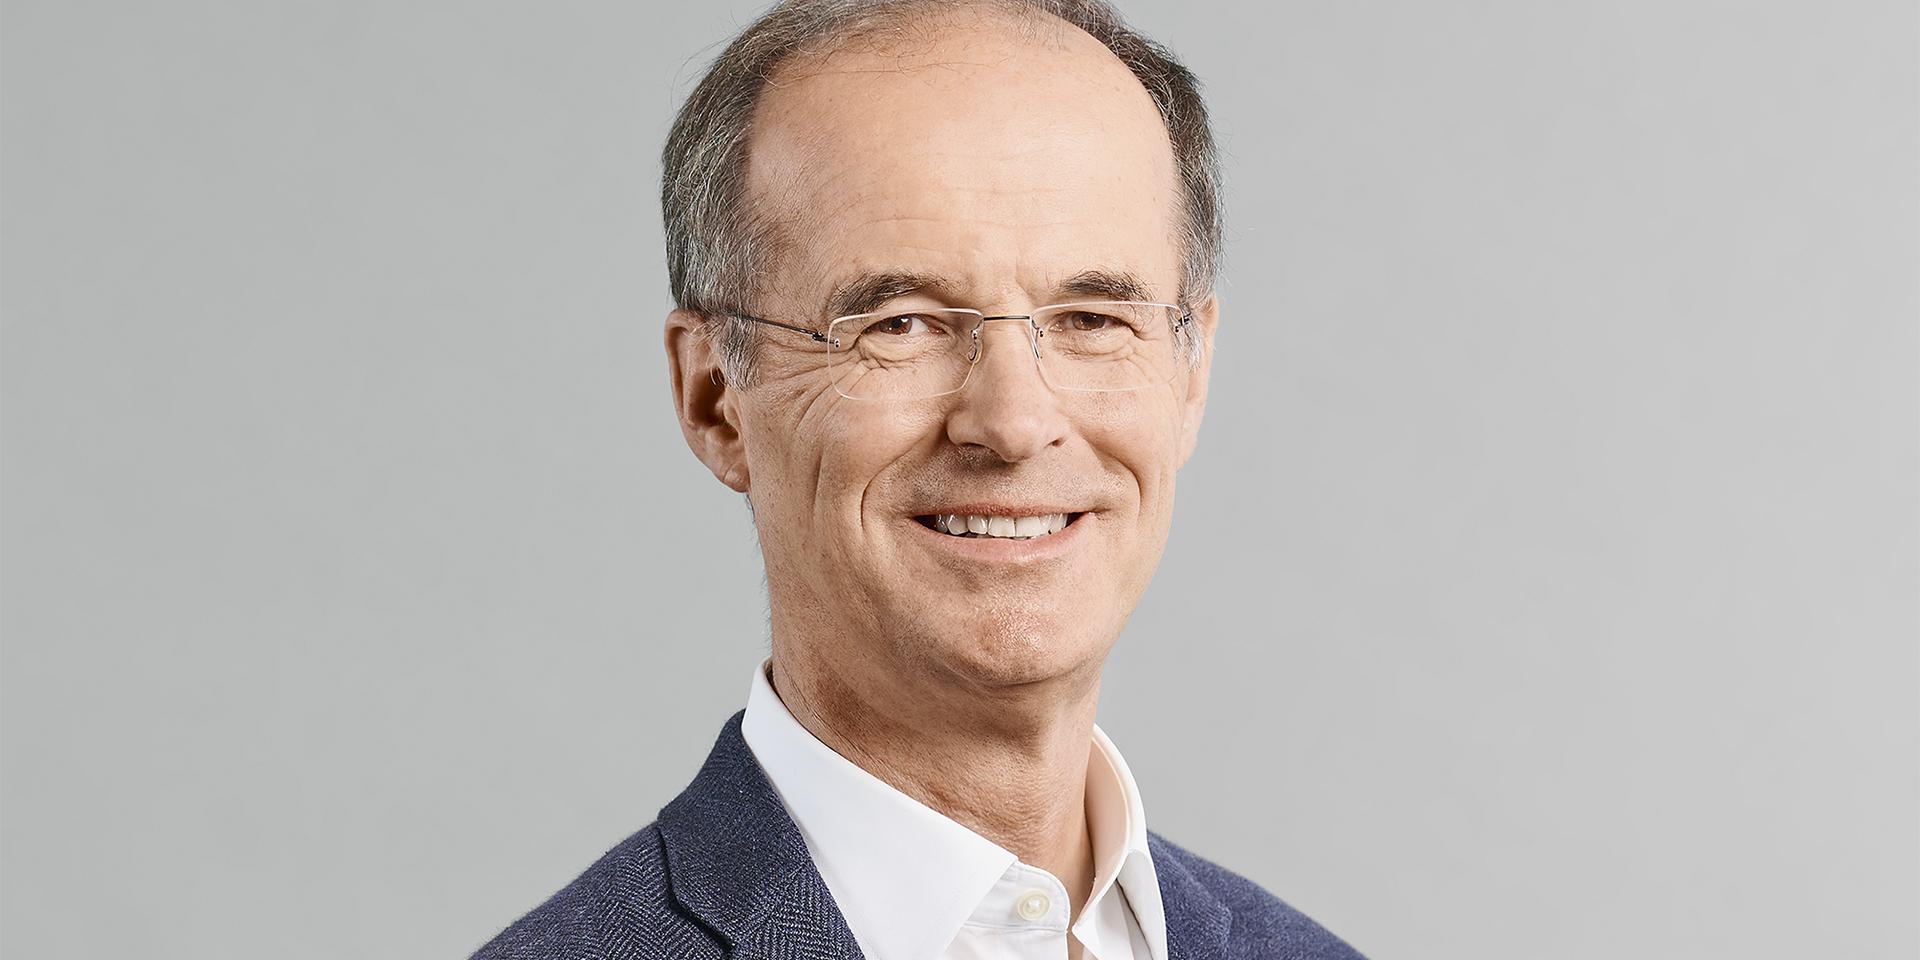 Dr. Nikolaus Blum